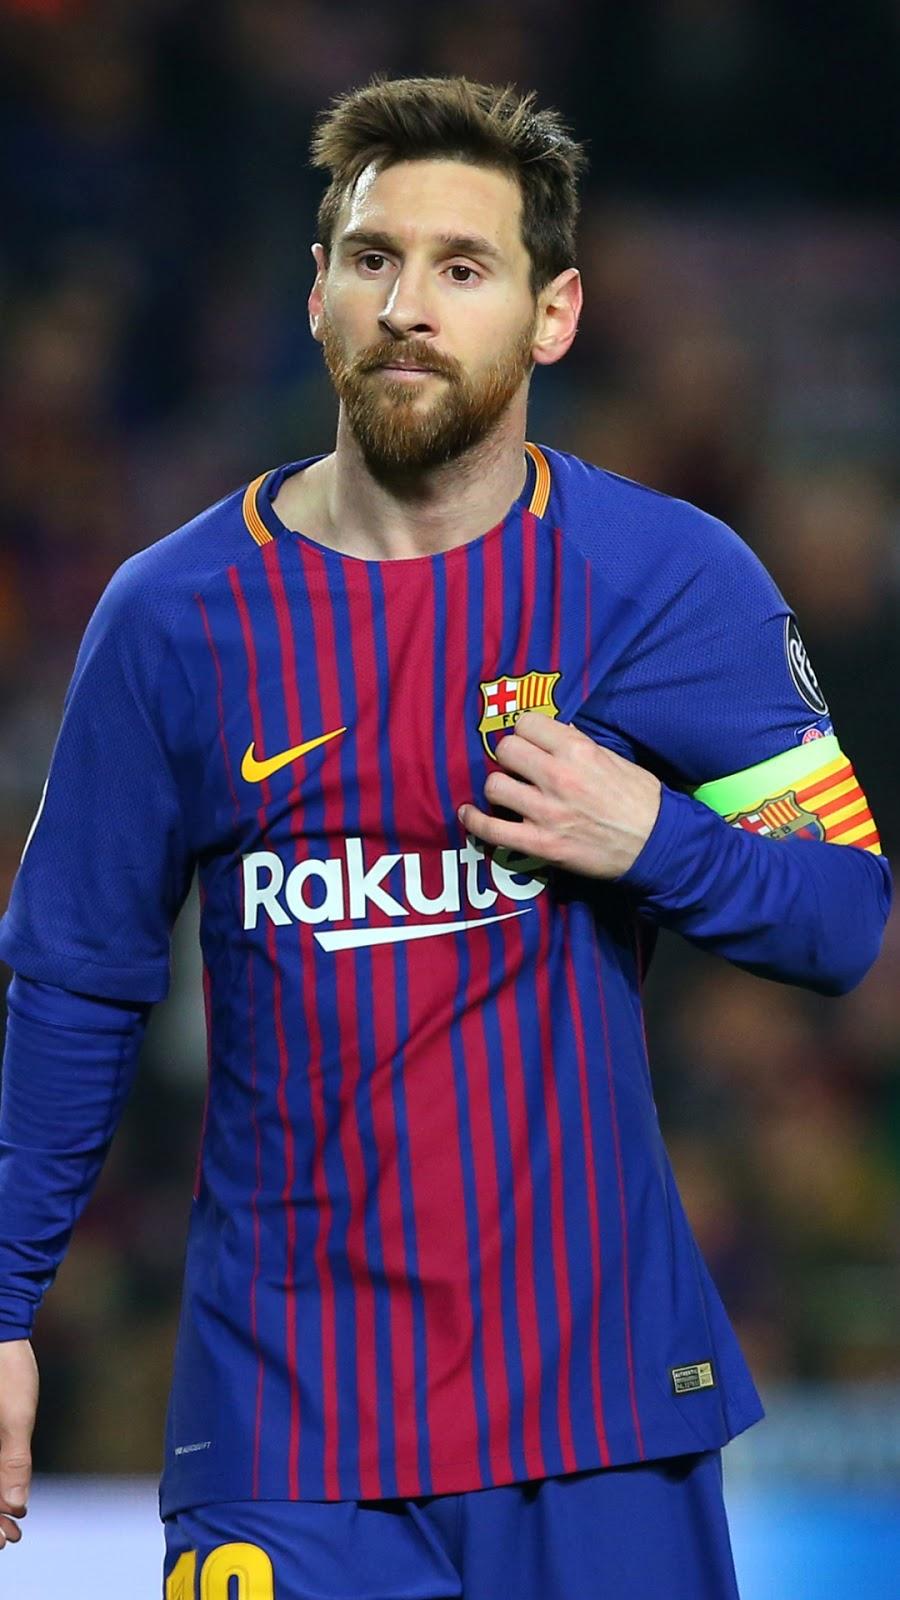 Lionel Messi Mobile Wallpaper - Messi L , HD Wallpaper & Backgrounds